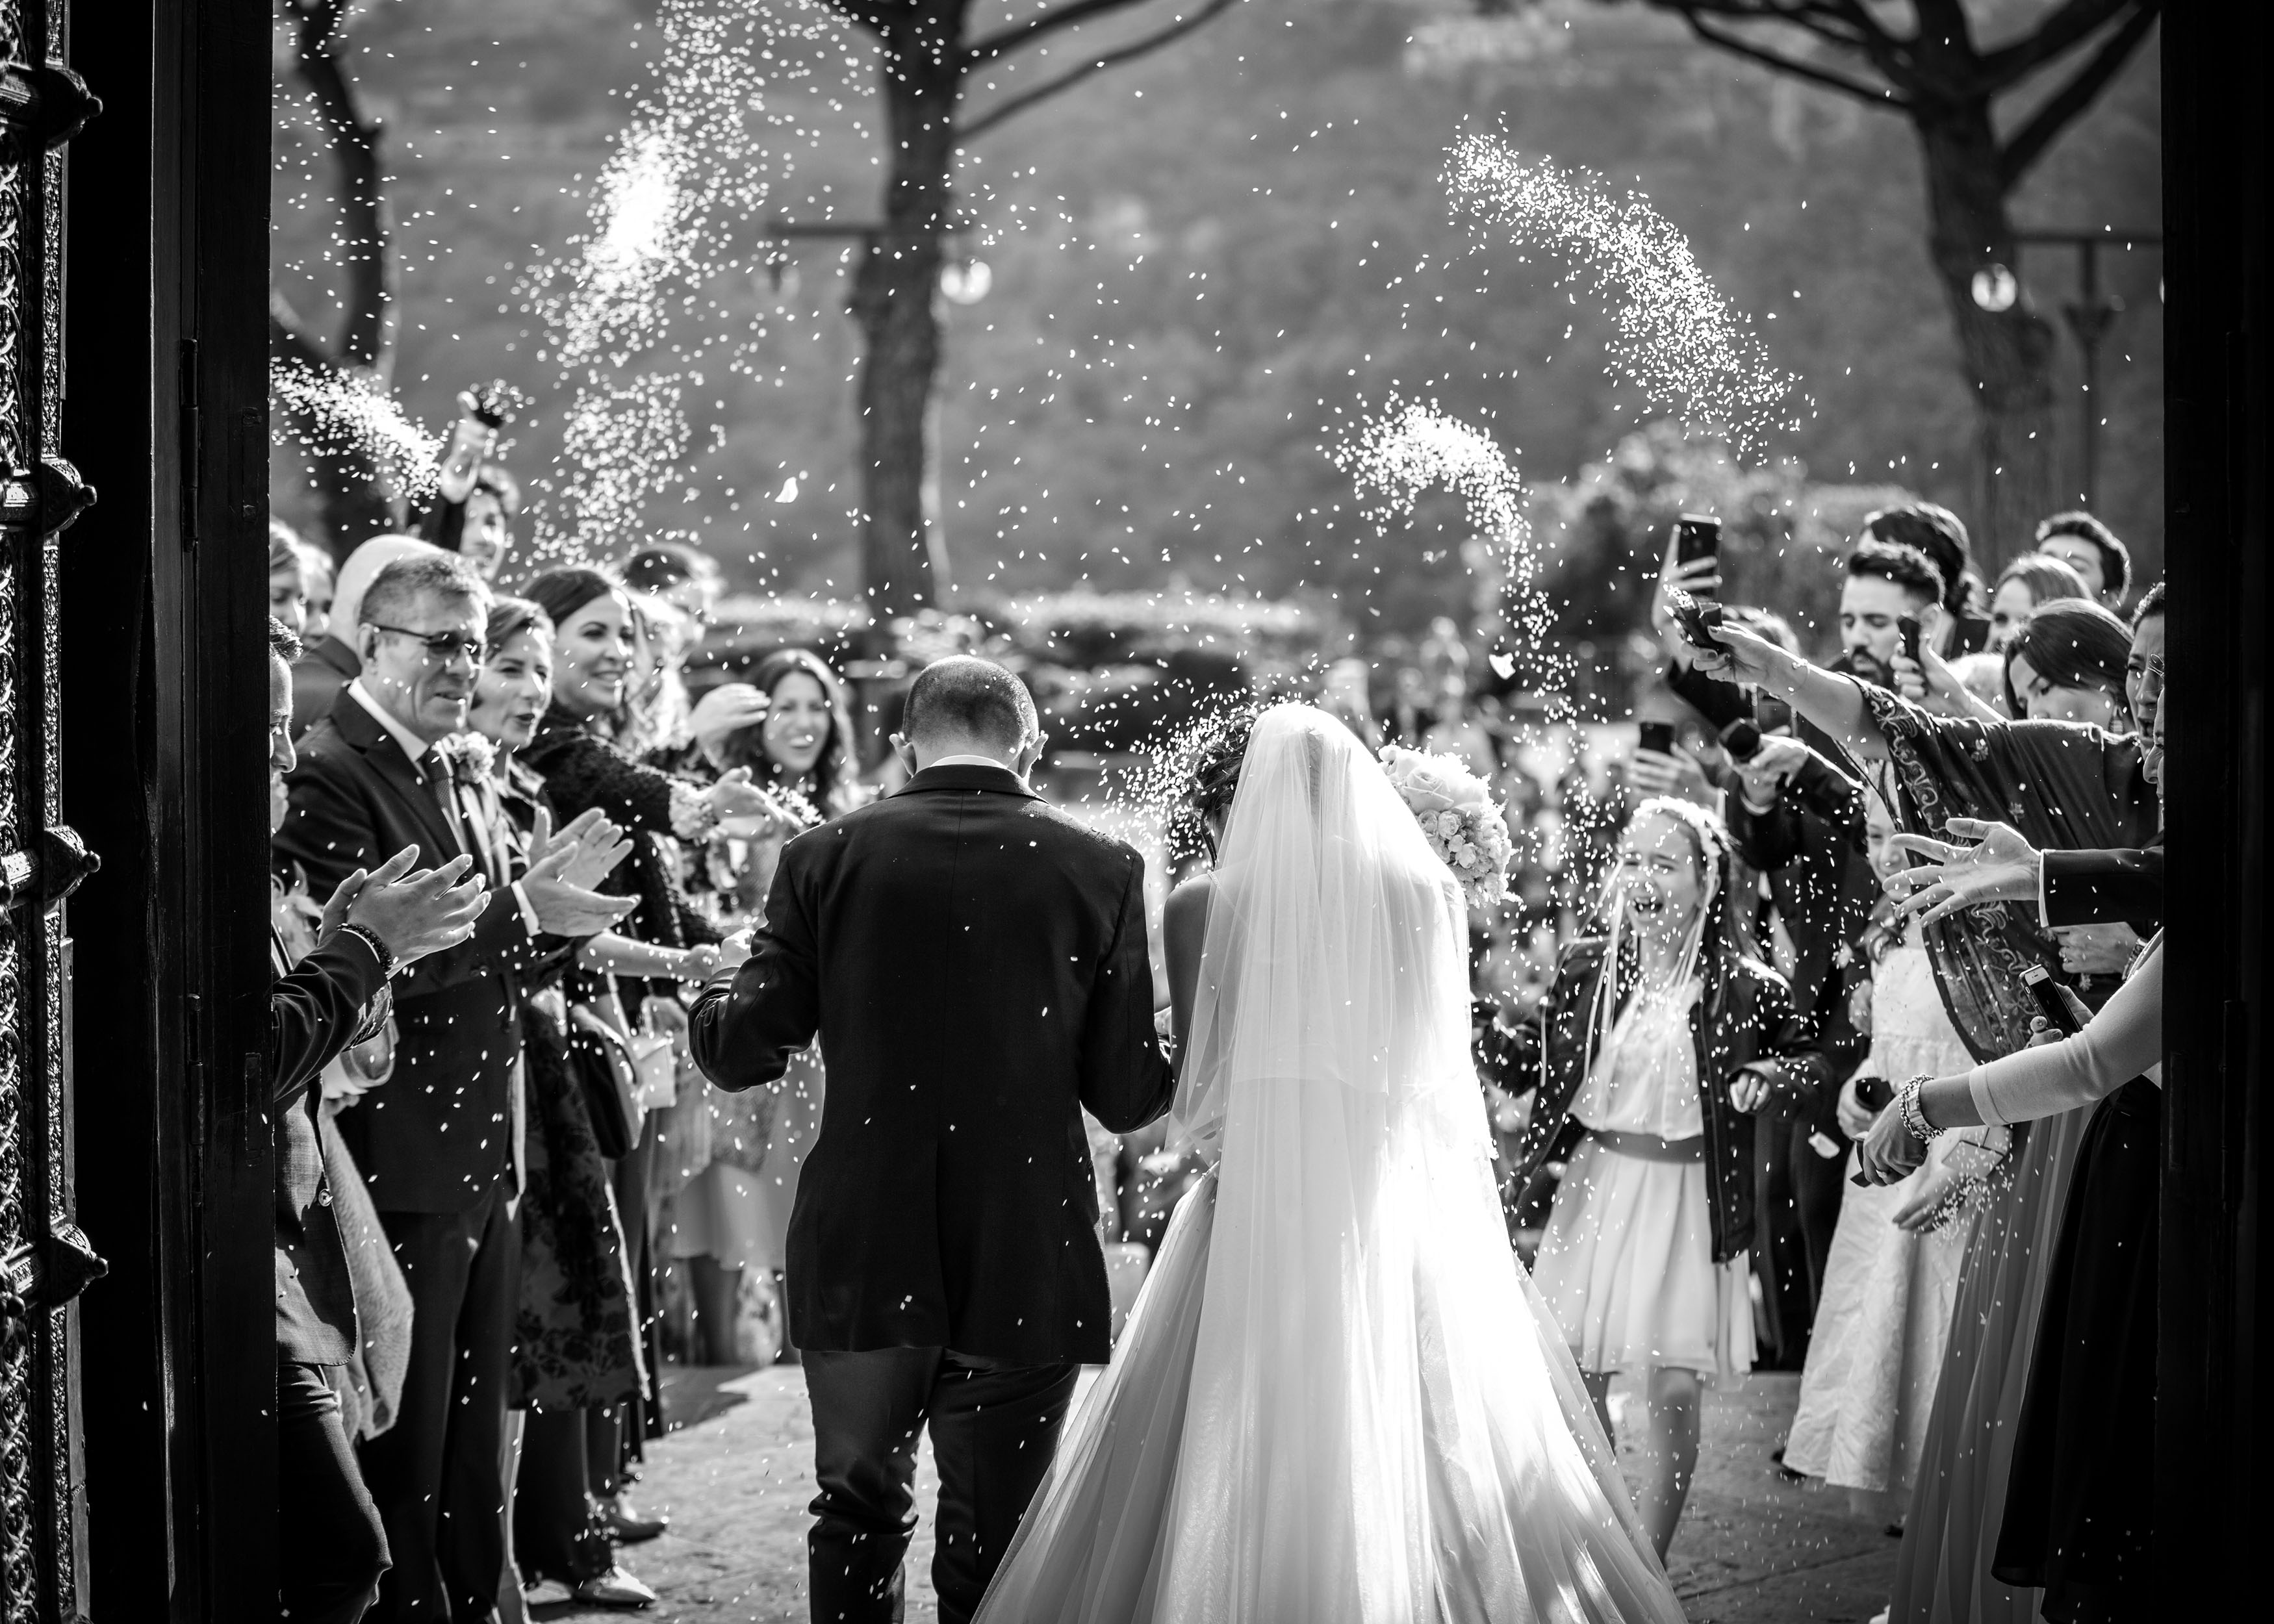 https://www.weddingamalfi.com/wp-content/uploads/Katia-Jorge-18-maggio-2019-29.jpg